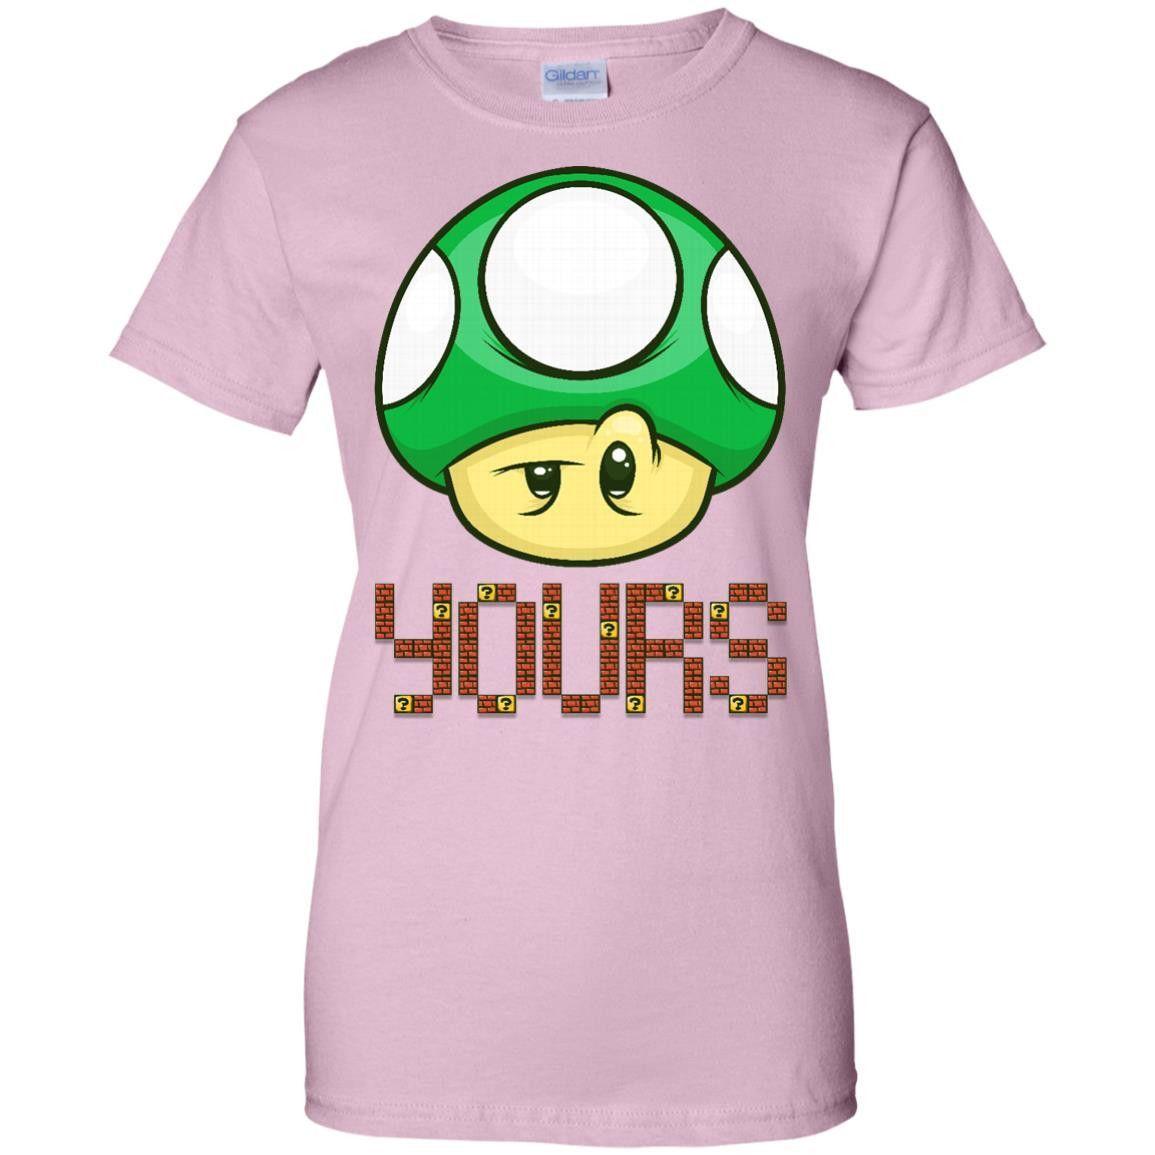 1 UP YOURS BY ARTISTICDYSLEXIA G200L Gildan Ladies' 100% Cotton T-Shirt